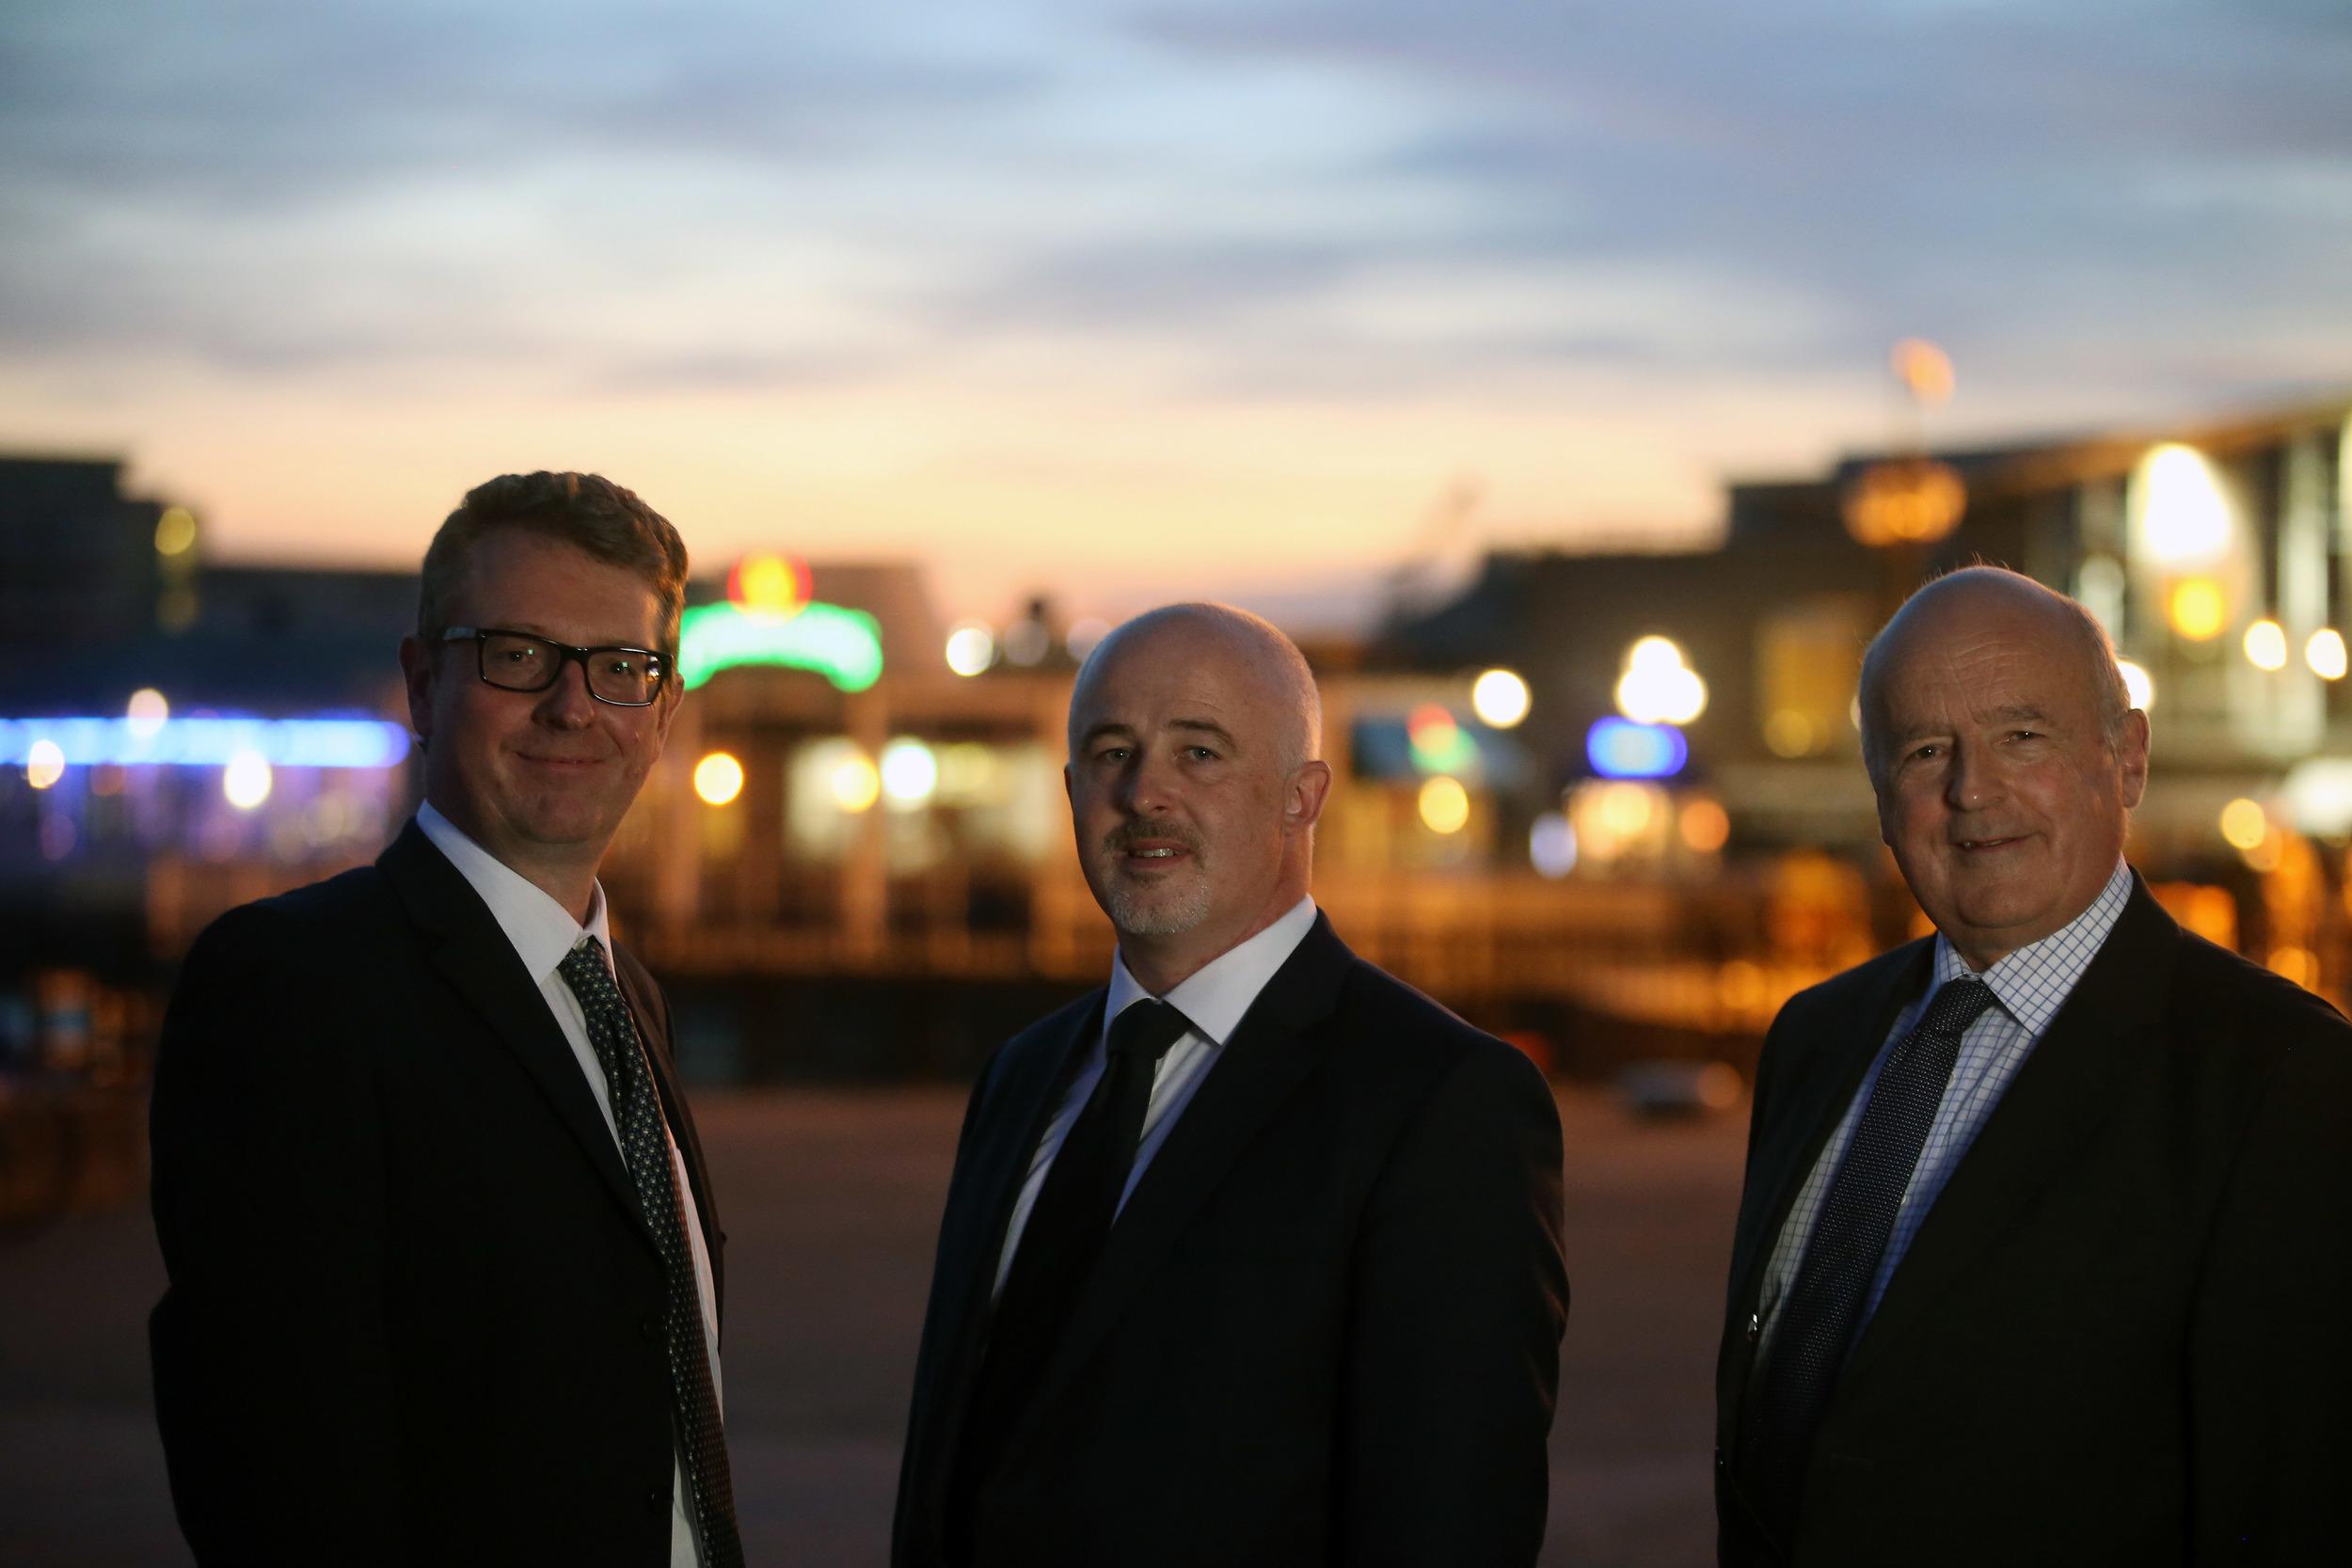 URI launch directors photo 3.jpg